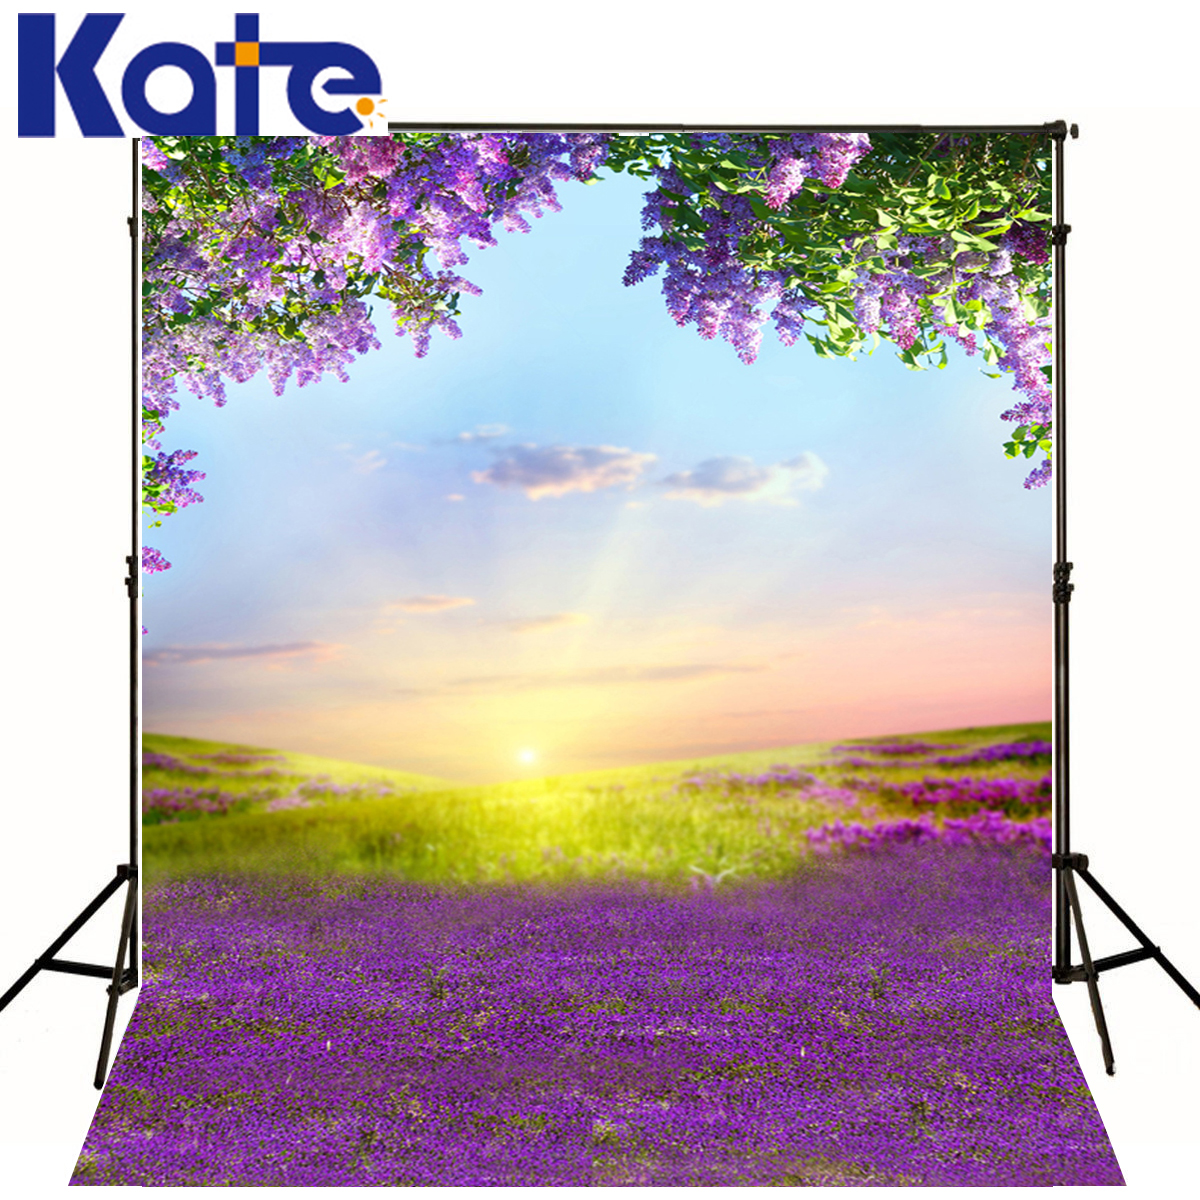 Photography Backdrops White Clouds Green Grass Backdrops Newborn Purple Flower Trees Sunshine Digital Studio Background юбка brusnika brusnika br032ewwsq30